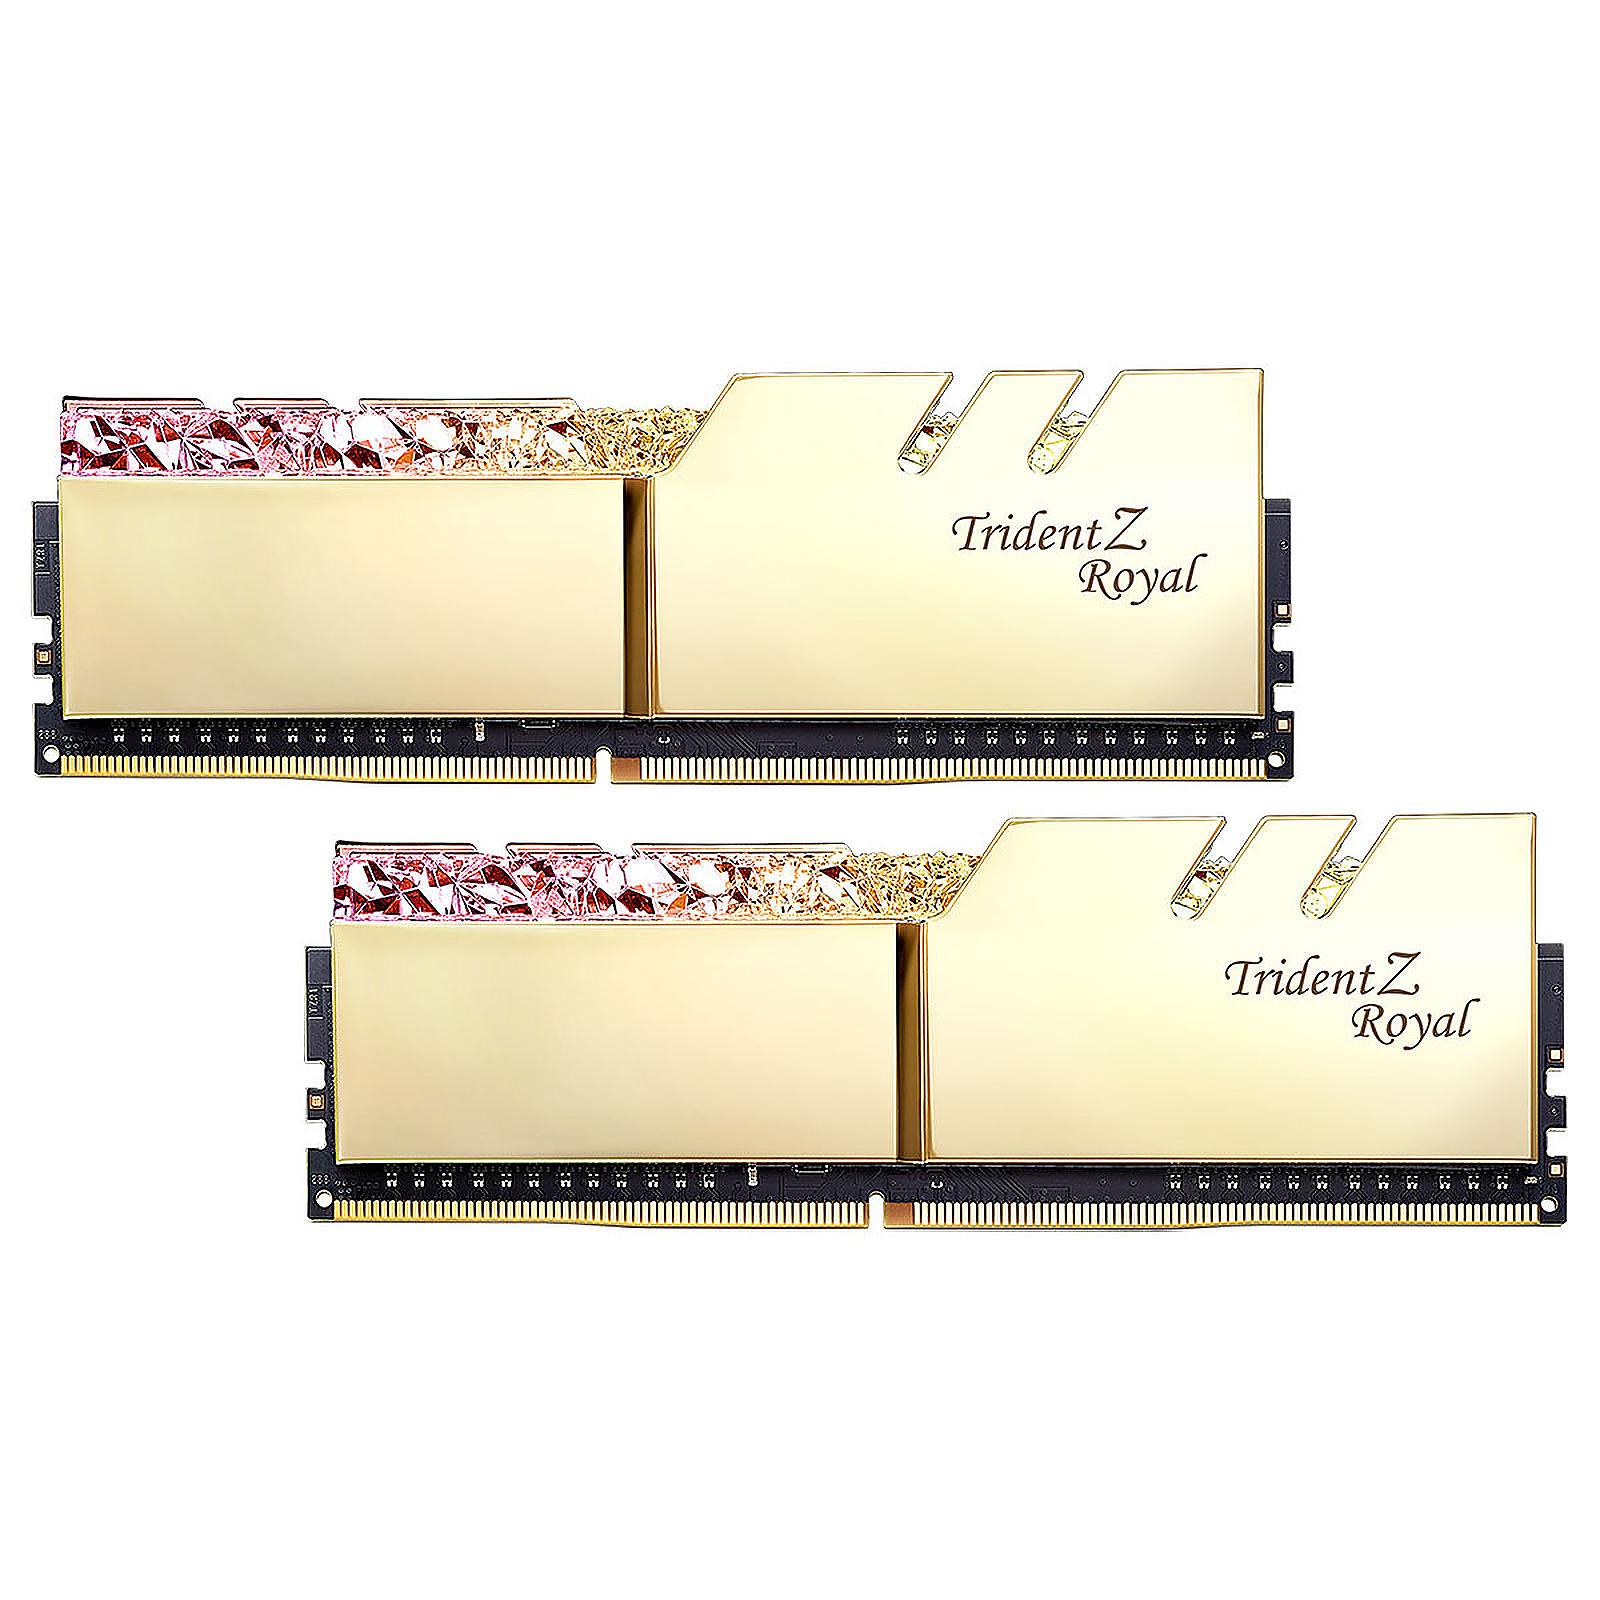 G.Skill Trident Z Royal 16 Go (2 x 8 Go) DDR4 3600 MHz CL14 - Or